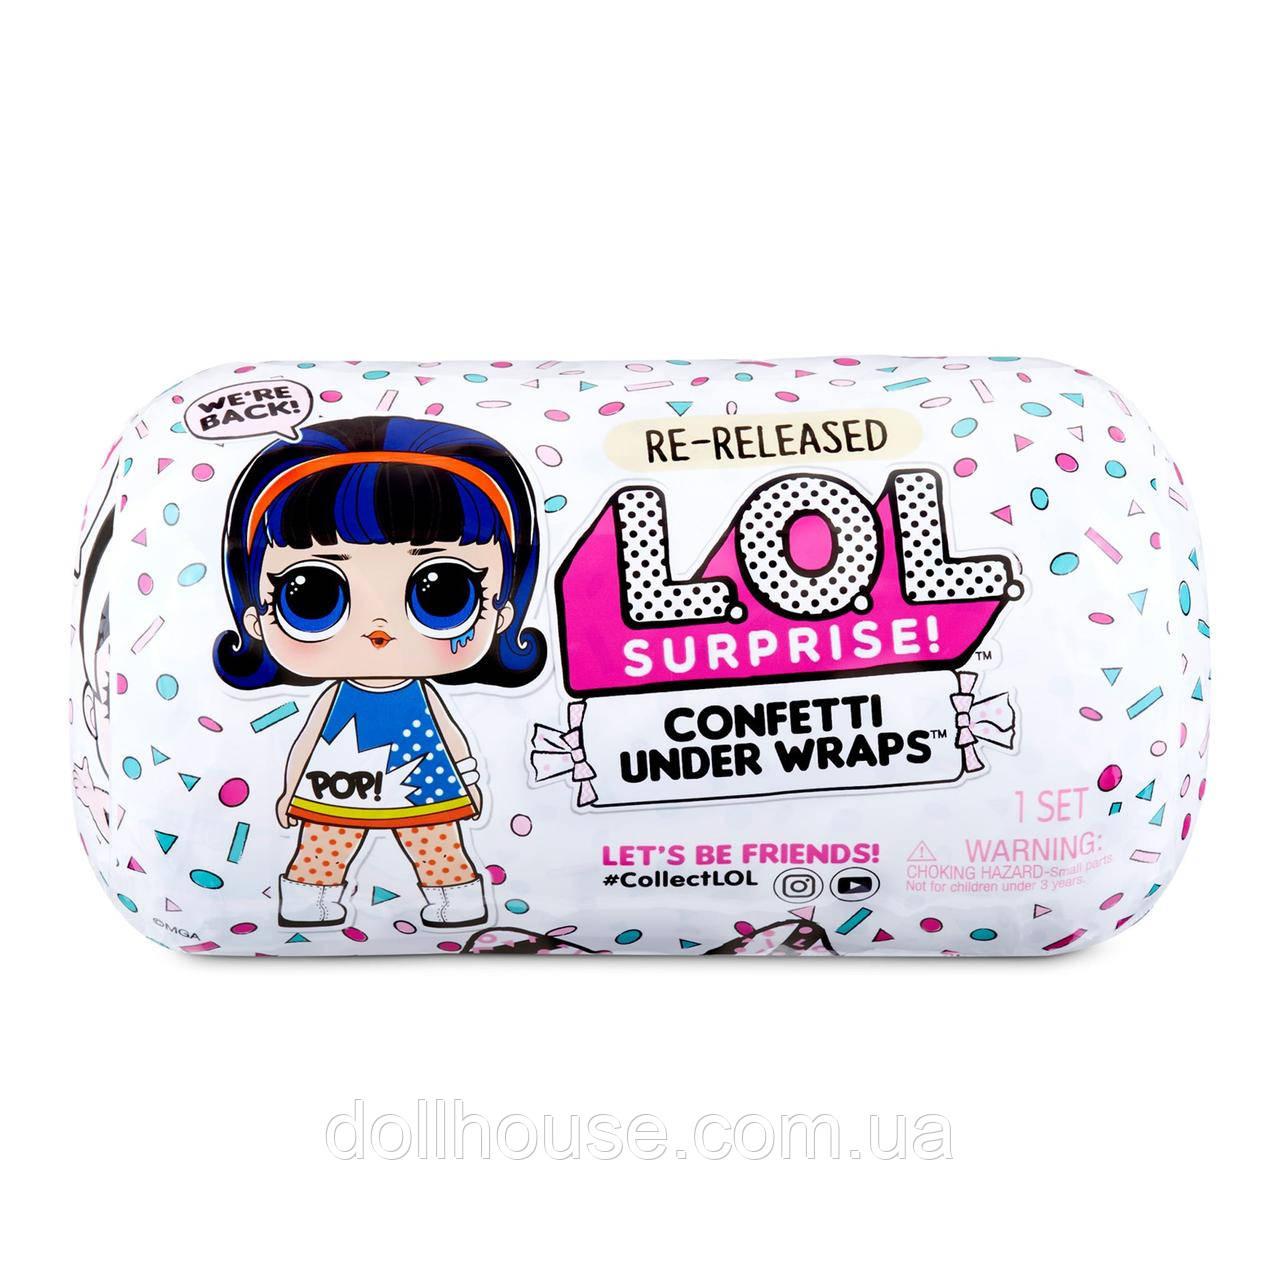 ЛОЛ сюрприз Конфетті Eye Spy L. O. L. Surprise! Confetti Present Surprise Re-released Doll with 15 Surprises